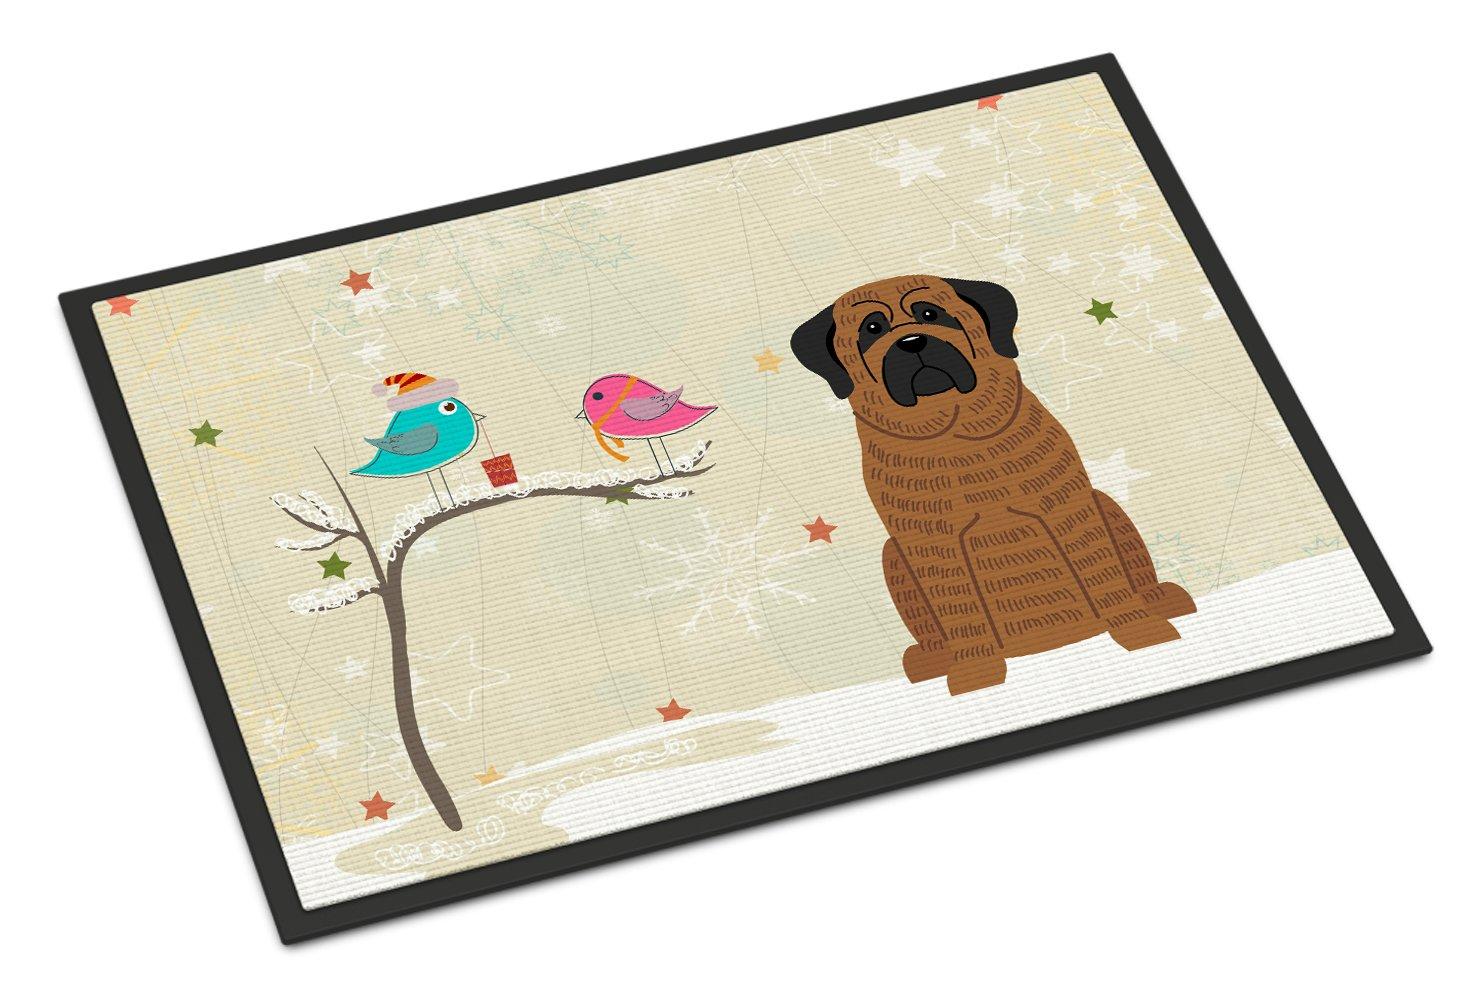 Carolines Treasures Christmas Presents between Friends Mastiff Brindle Indoor or Outdoor Mat 24x36 BB2487JMAT 24 x 36 Multicolor